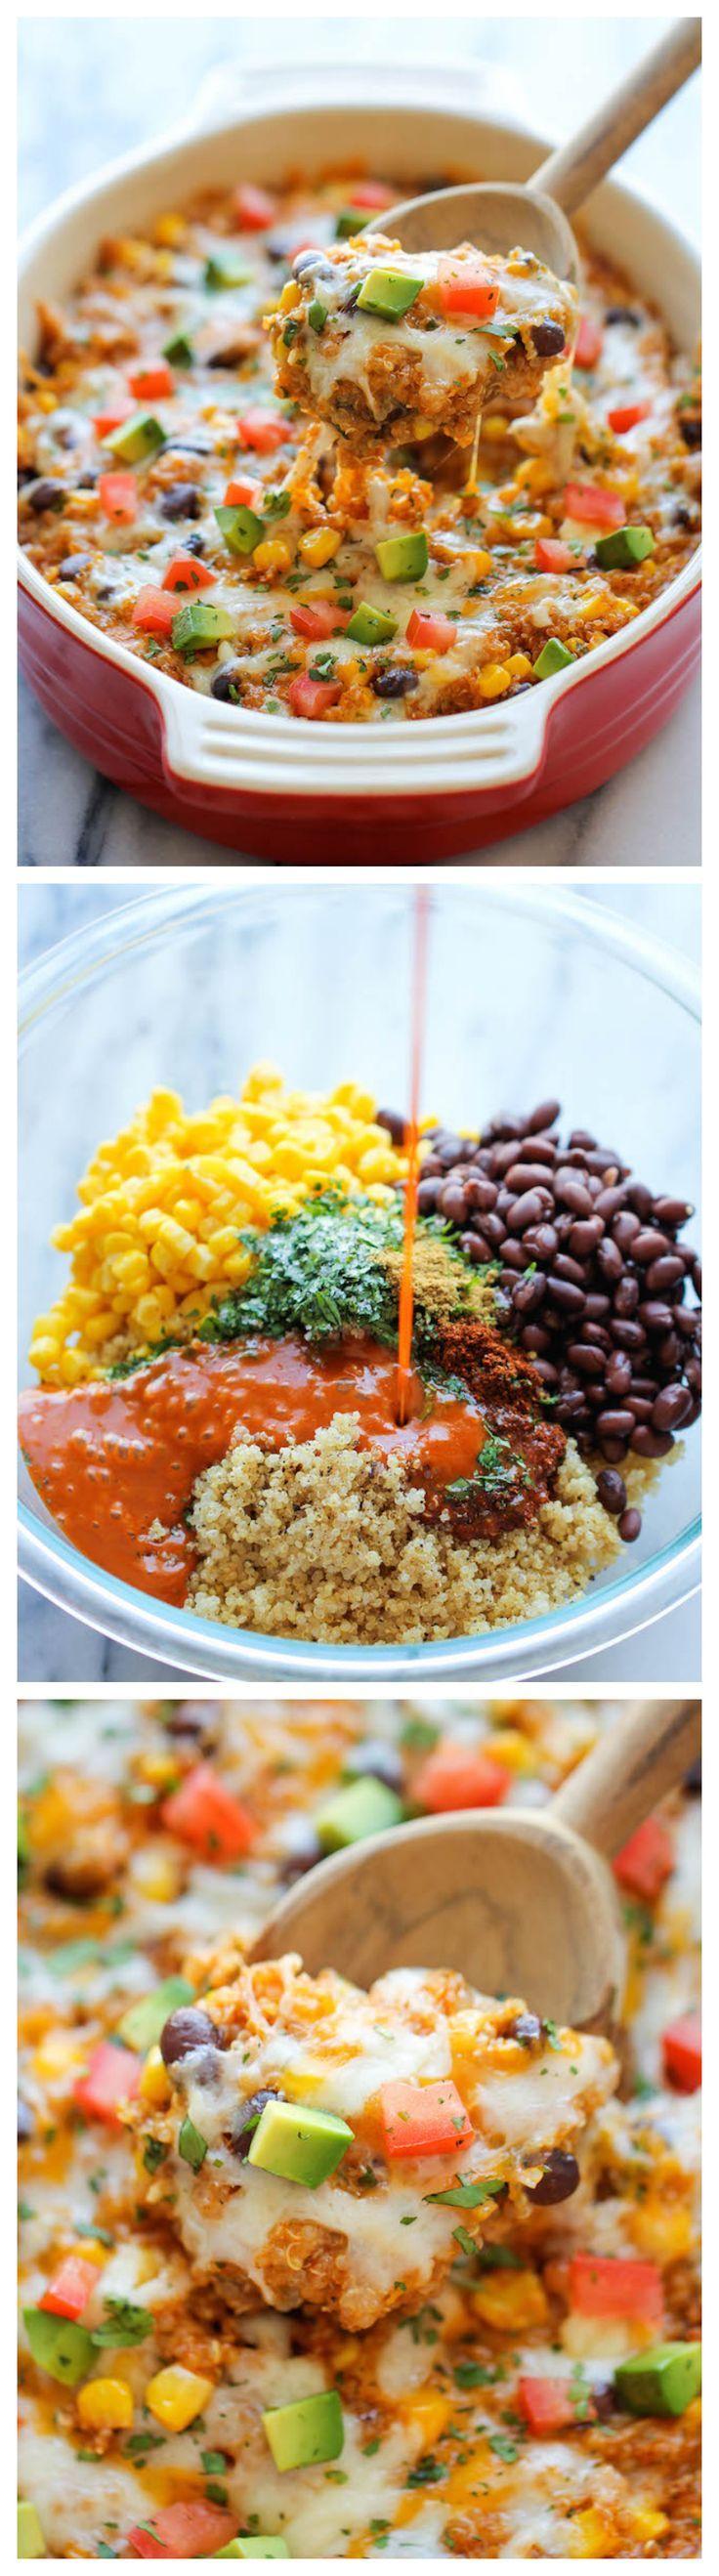 Quinoa Enchilada Casserole - A lightened-up, healthy enchilada bake chockfull of quinoa, black beans and cheesy goodness! To make vegan just use vegan cheese!